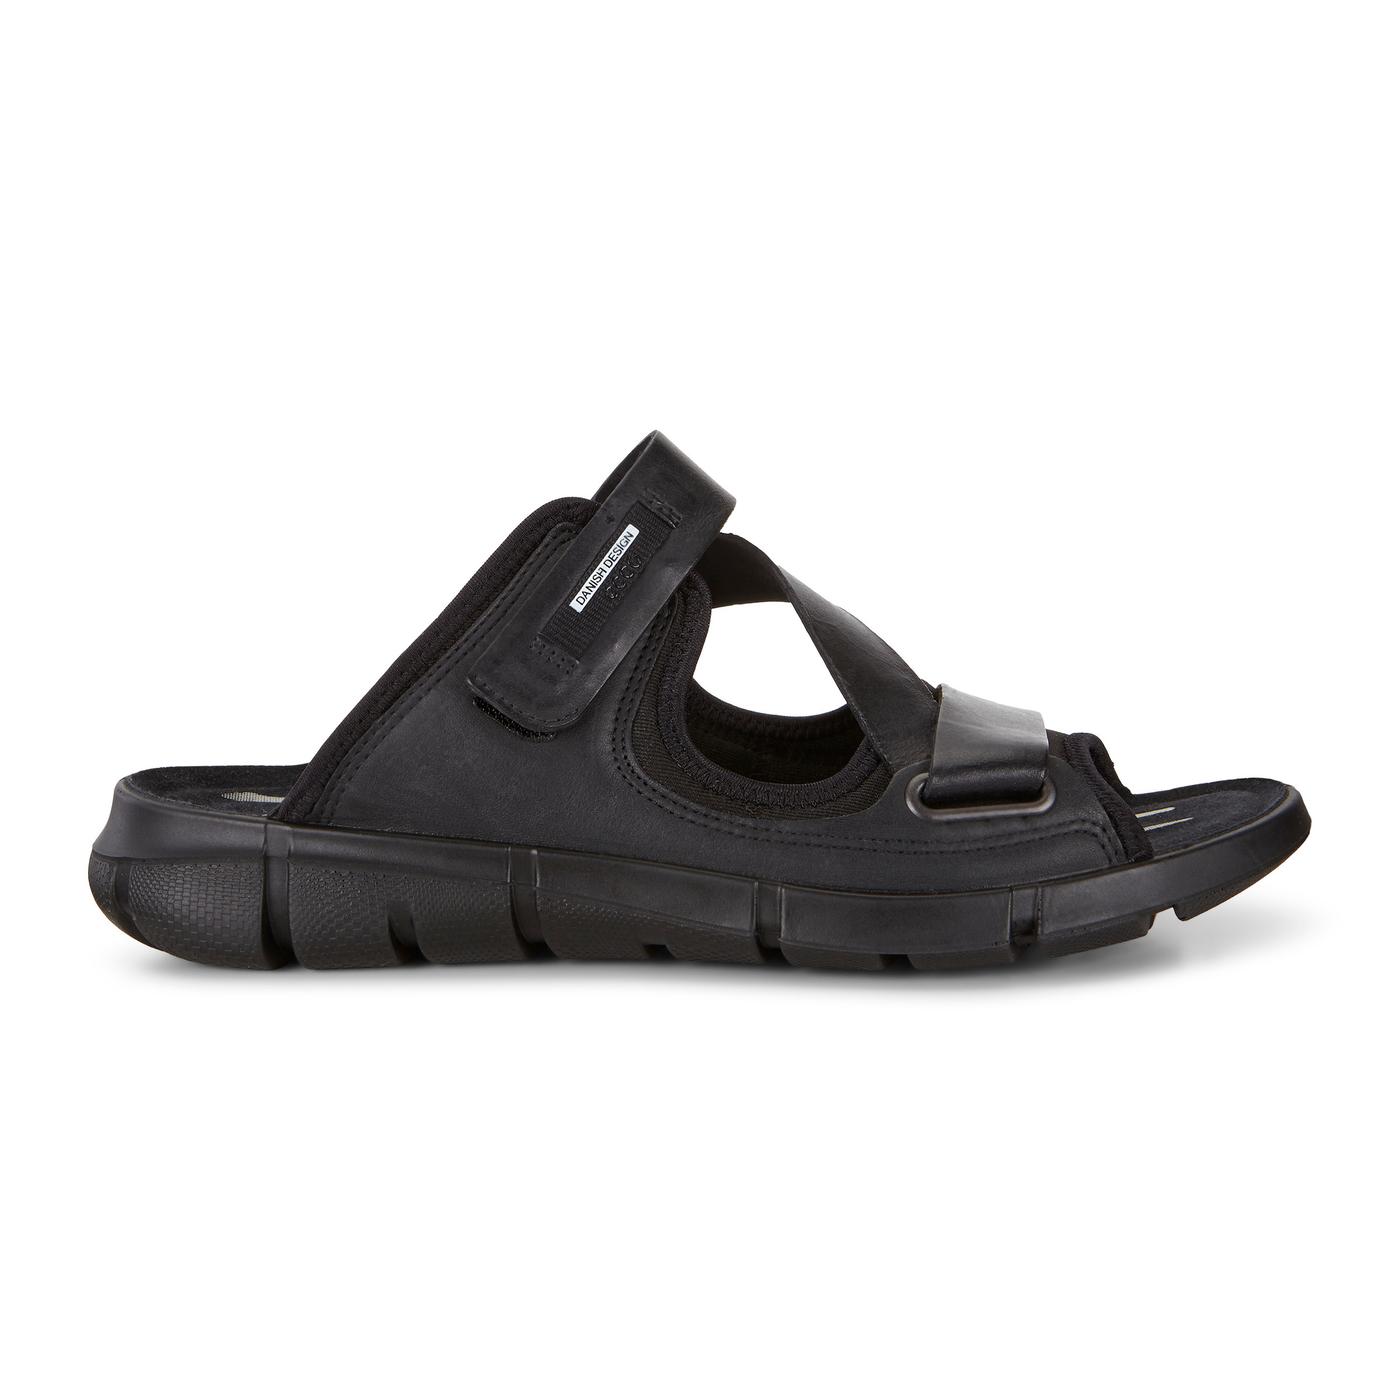 4b56877d628e ECCO Men s Intrinsic Sandal